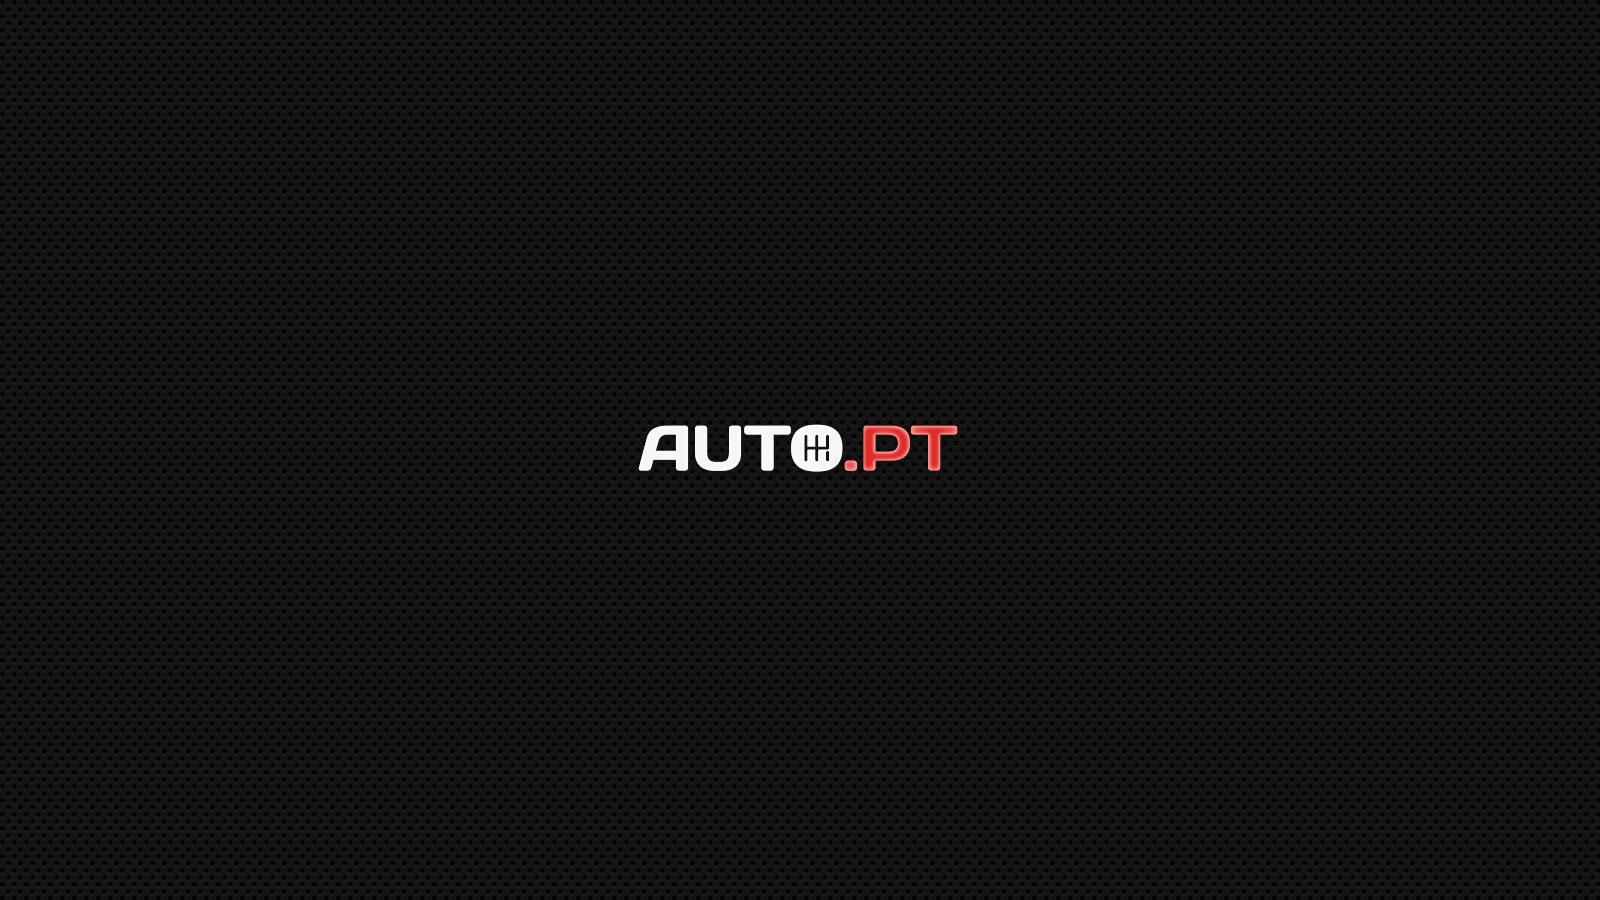 autopt-004